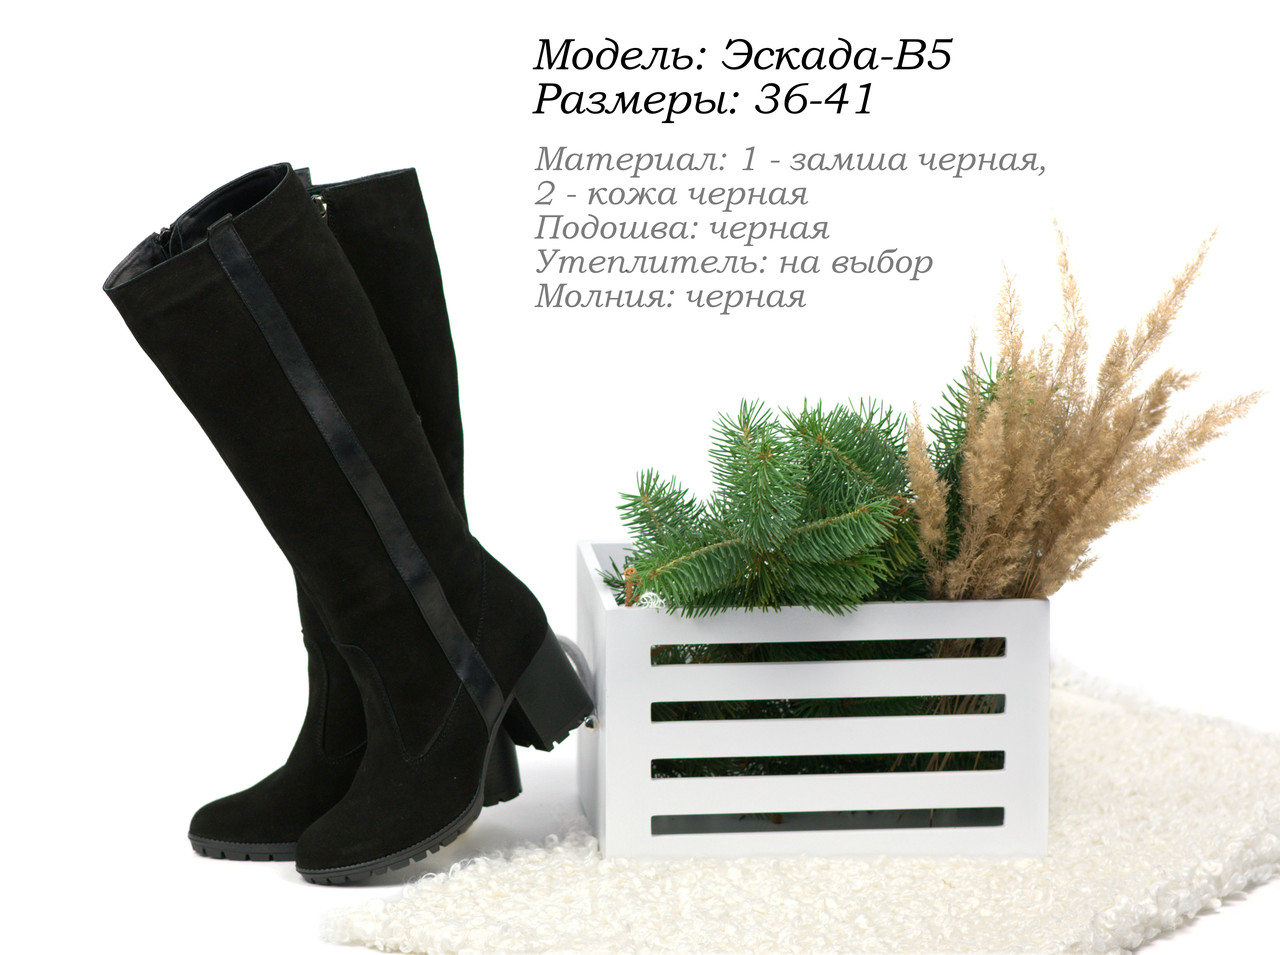 Зимние сапоги. ОПТ. Украина.